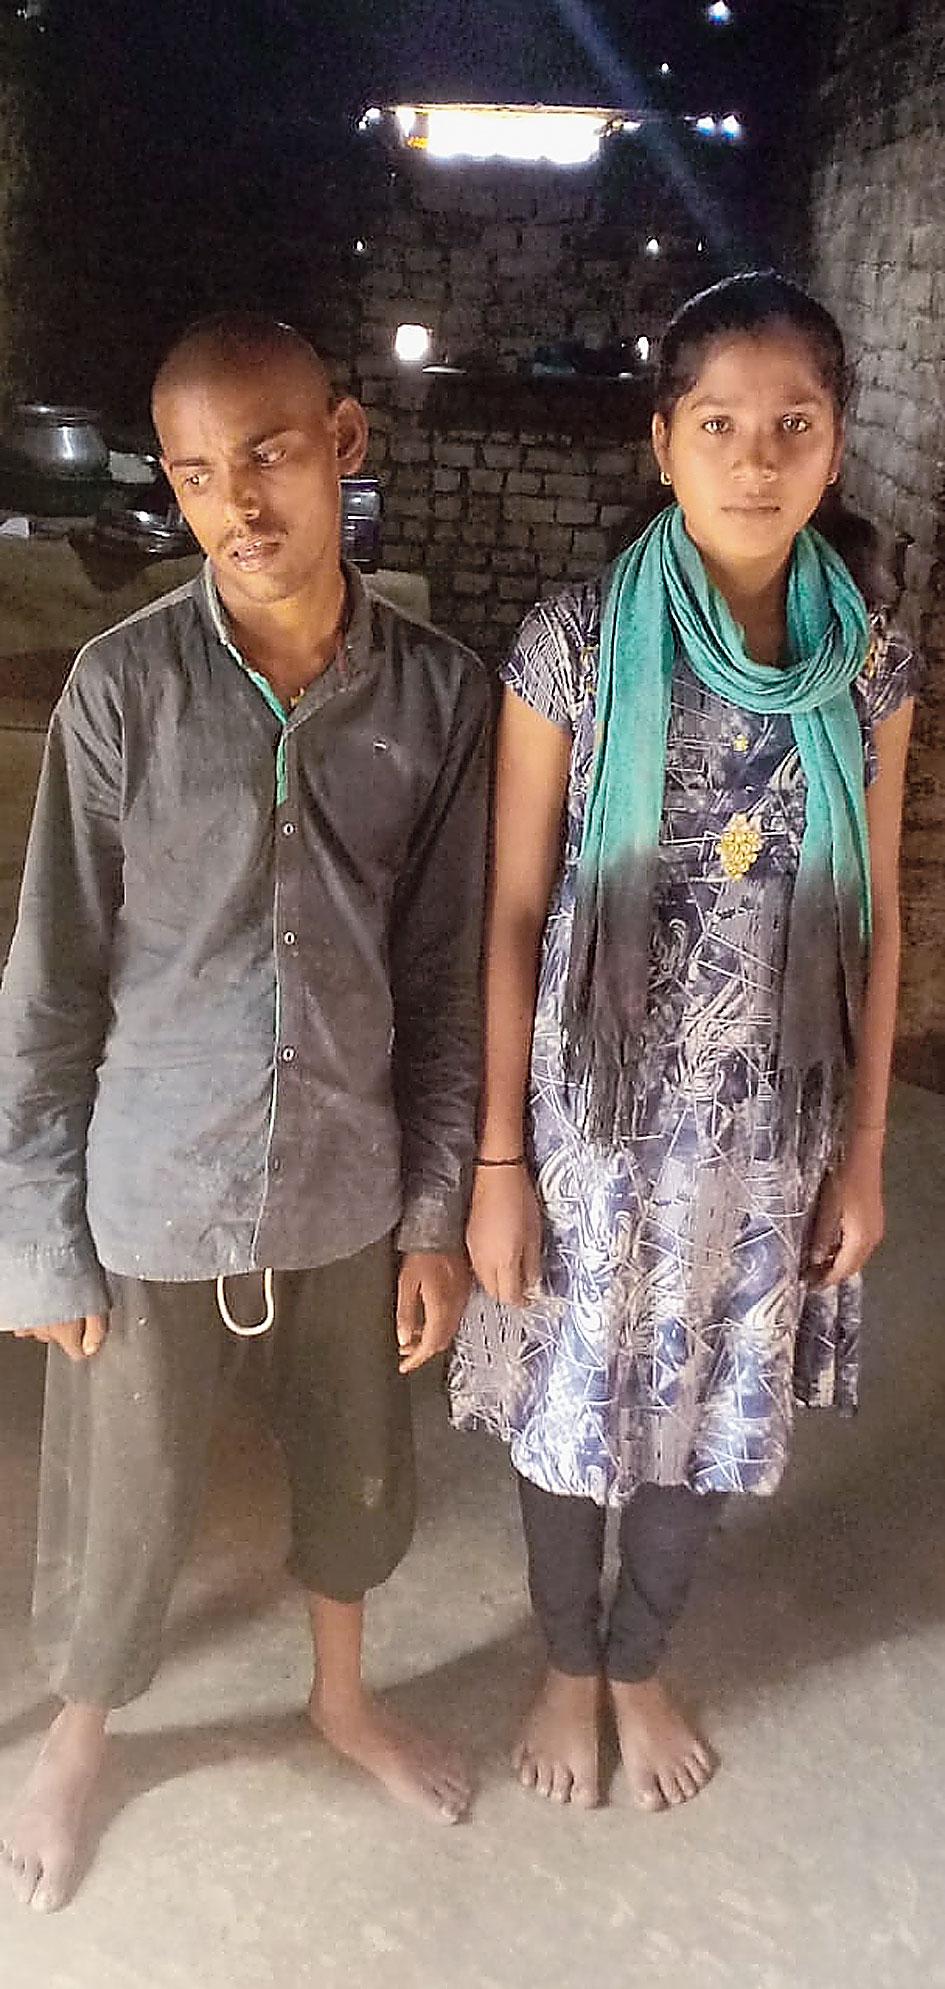 Arjun Mahto's son and daughter at Ichak in Hazaribagh on Thursday.